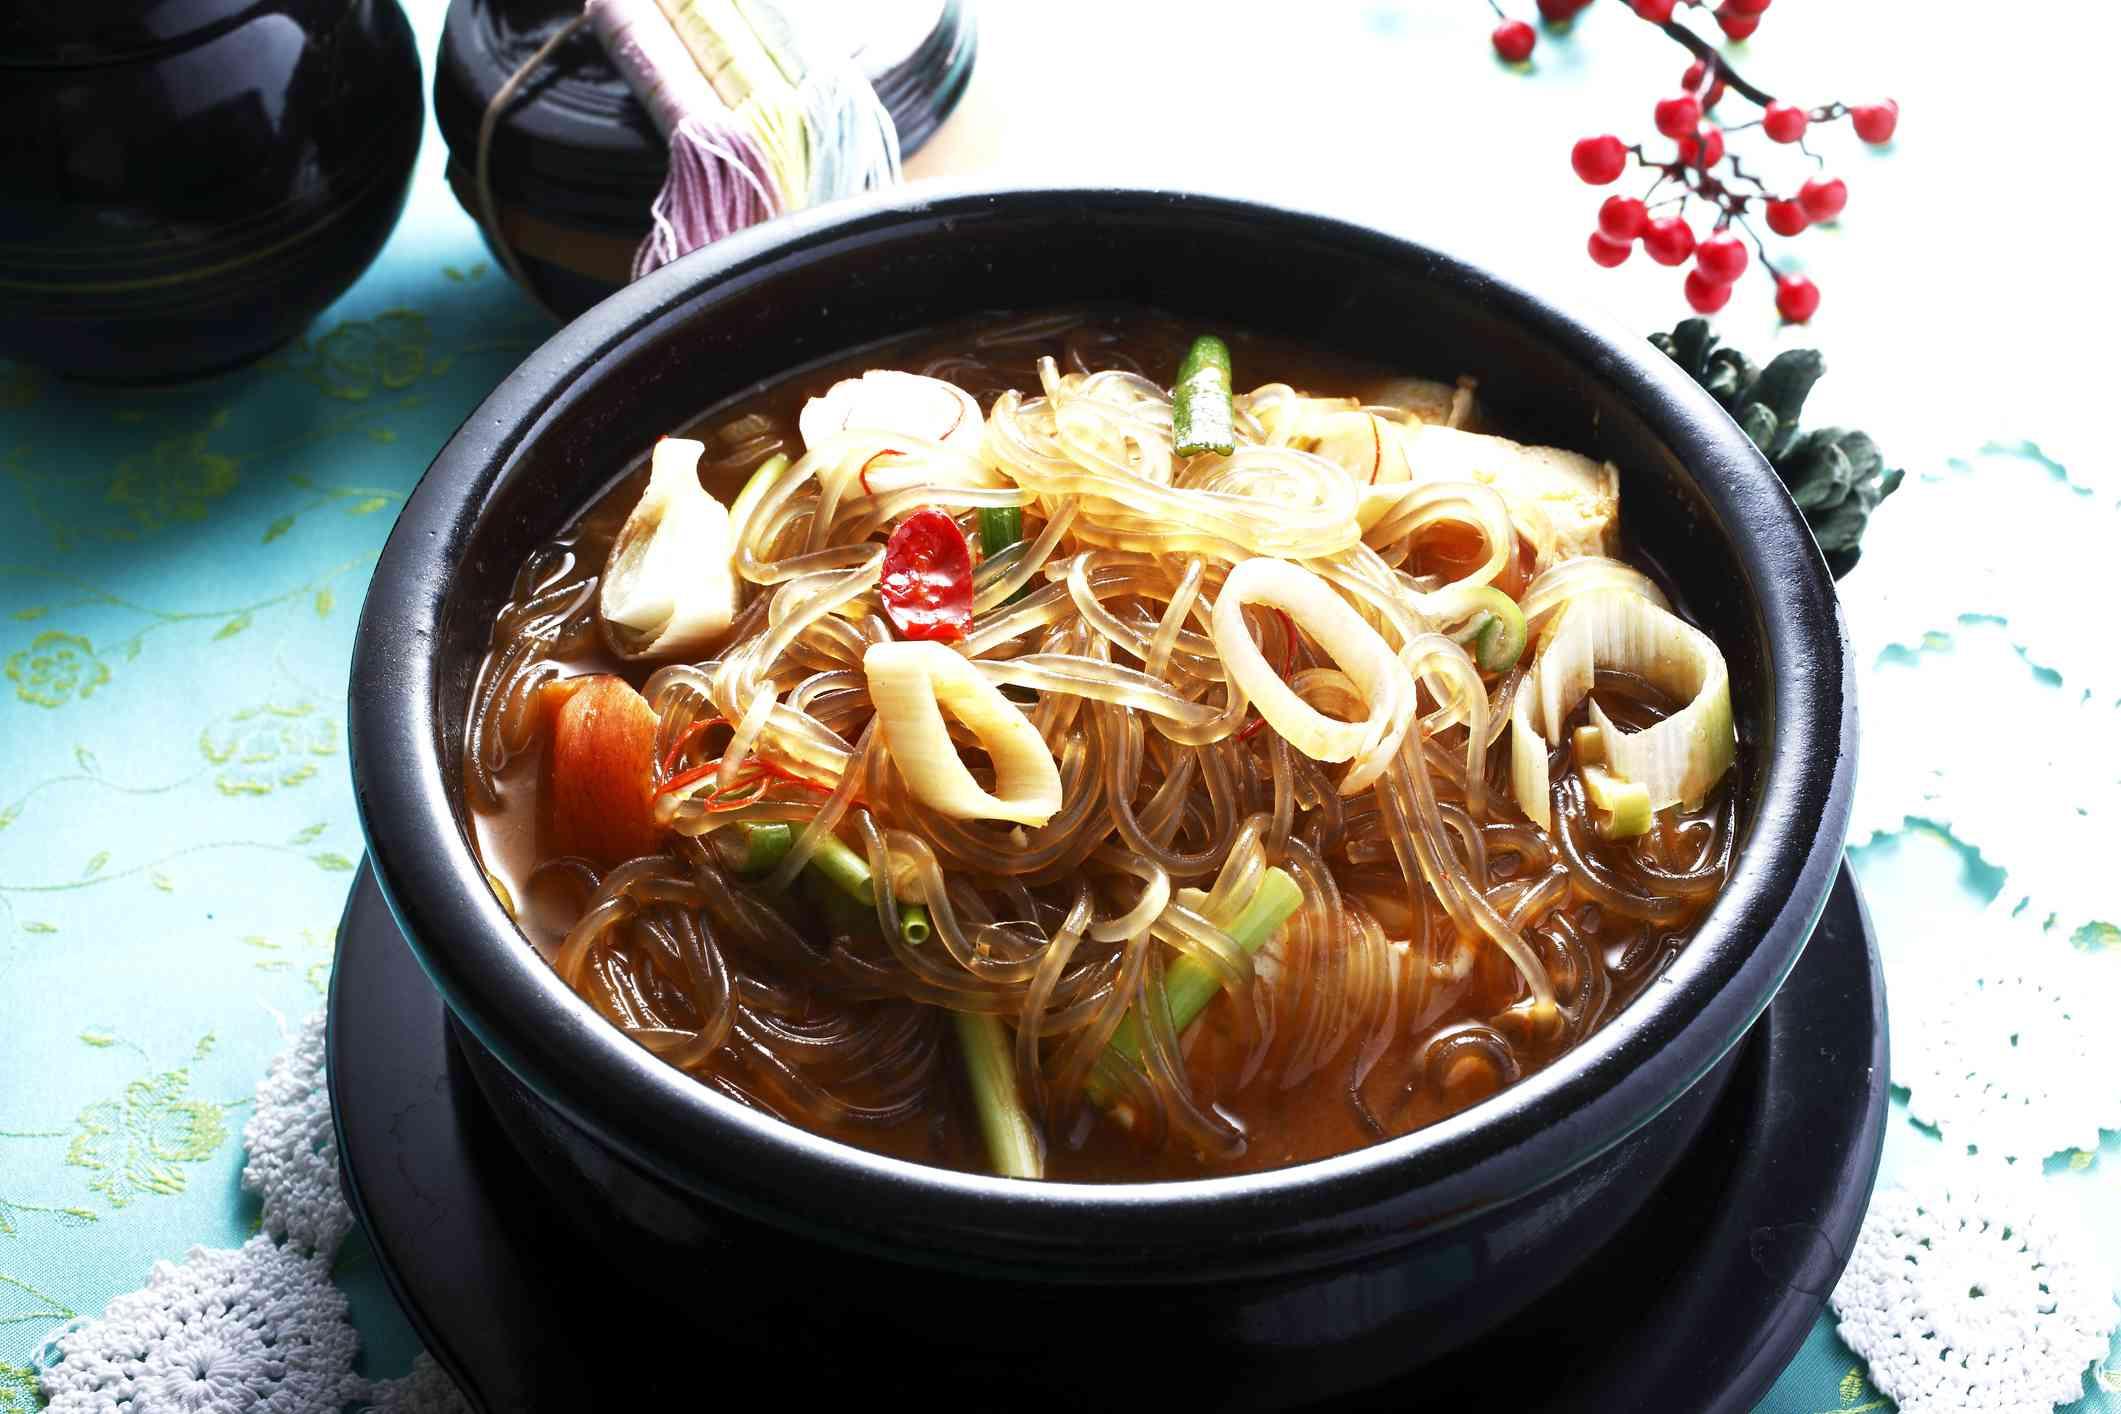 korean food, cellophane noodles